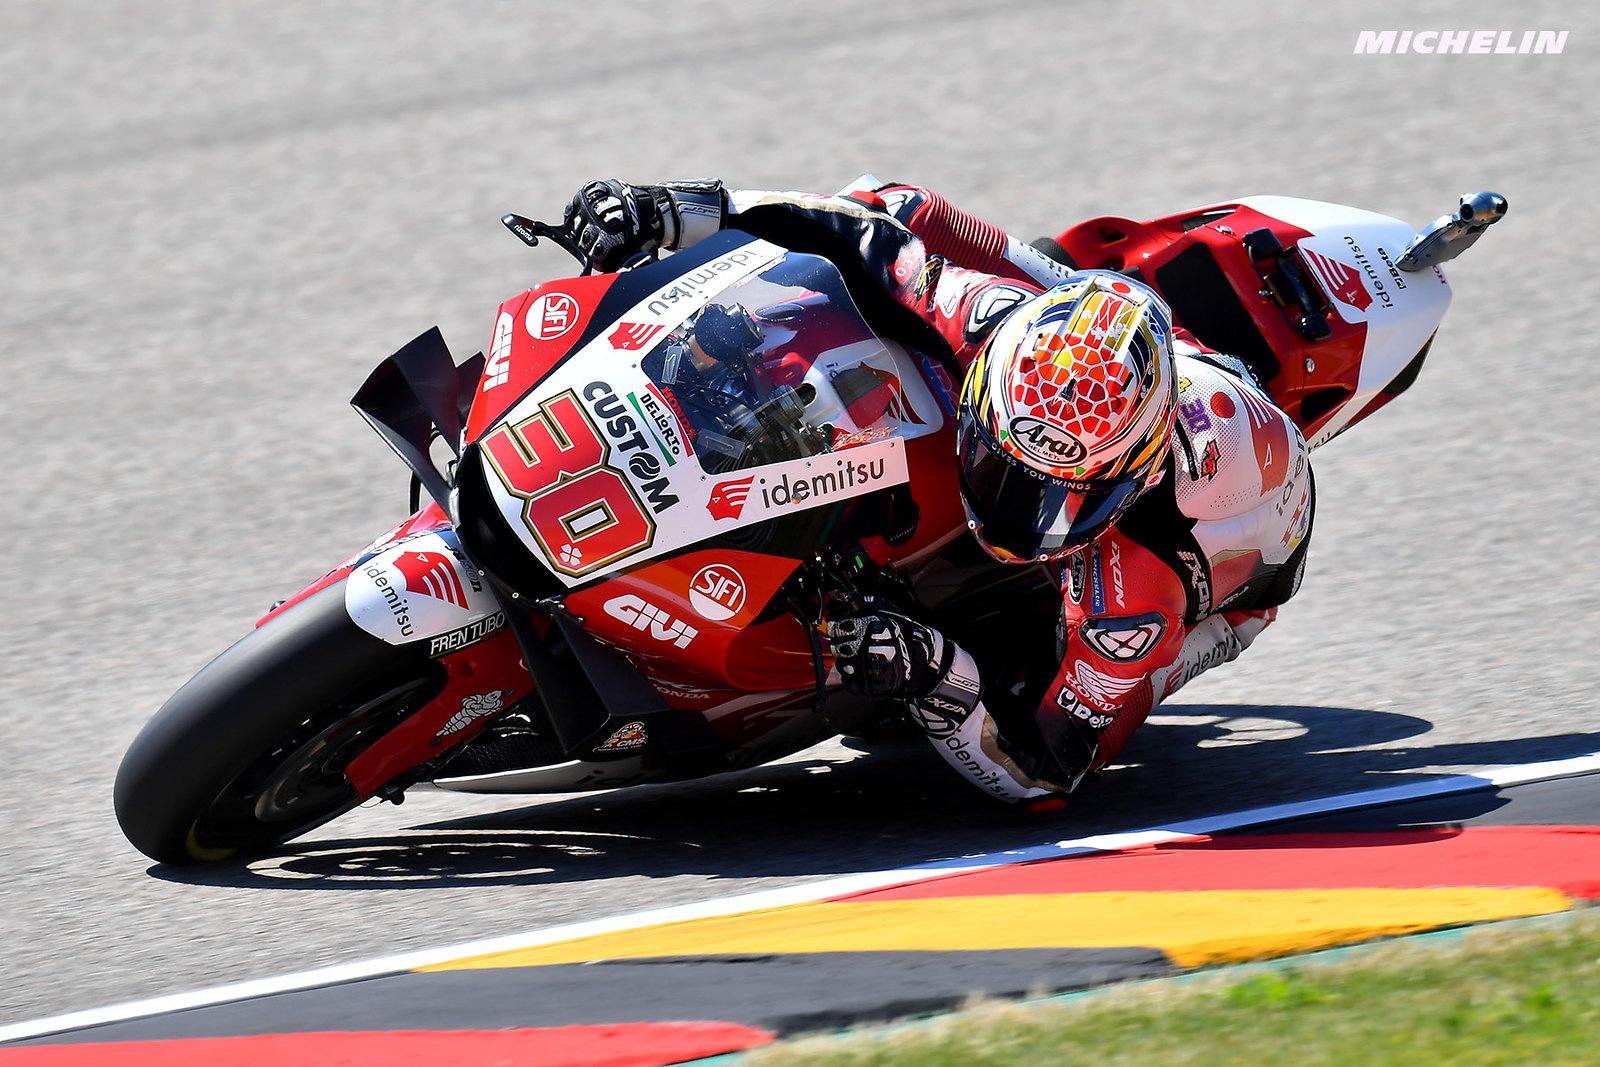 MotoGP2021 ドイツGP 初日総合6位 中上 貴晶「セクター1を改善することが必要」